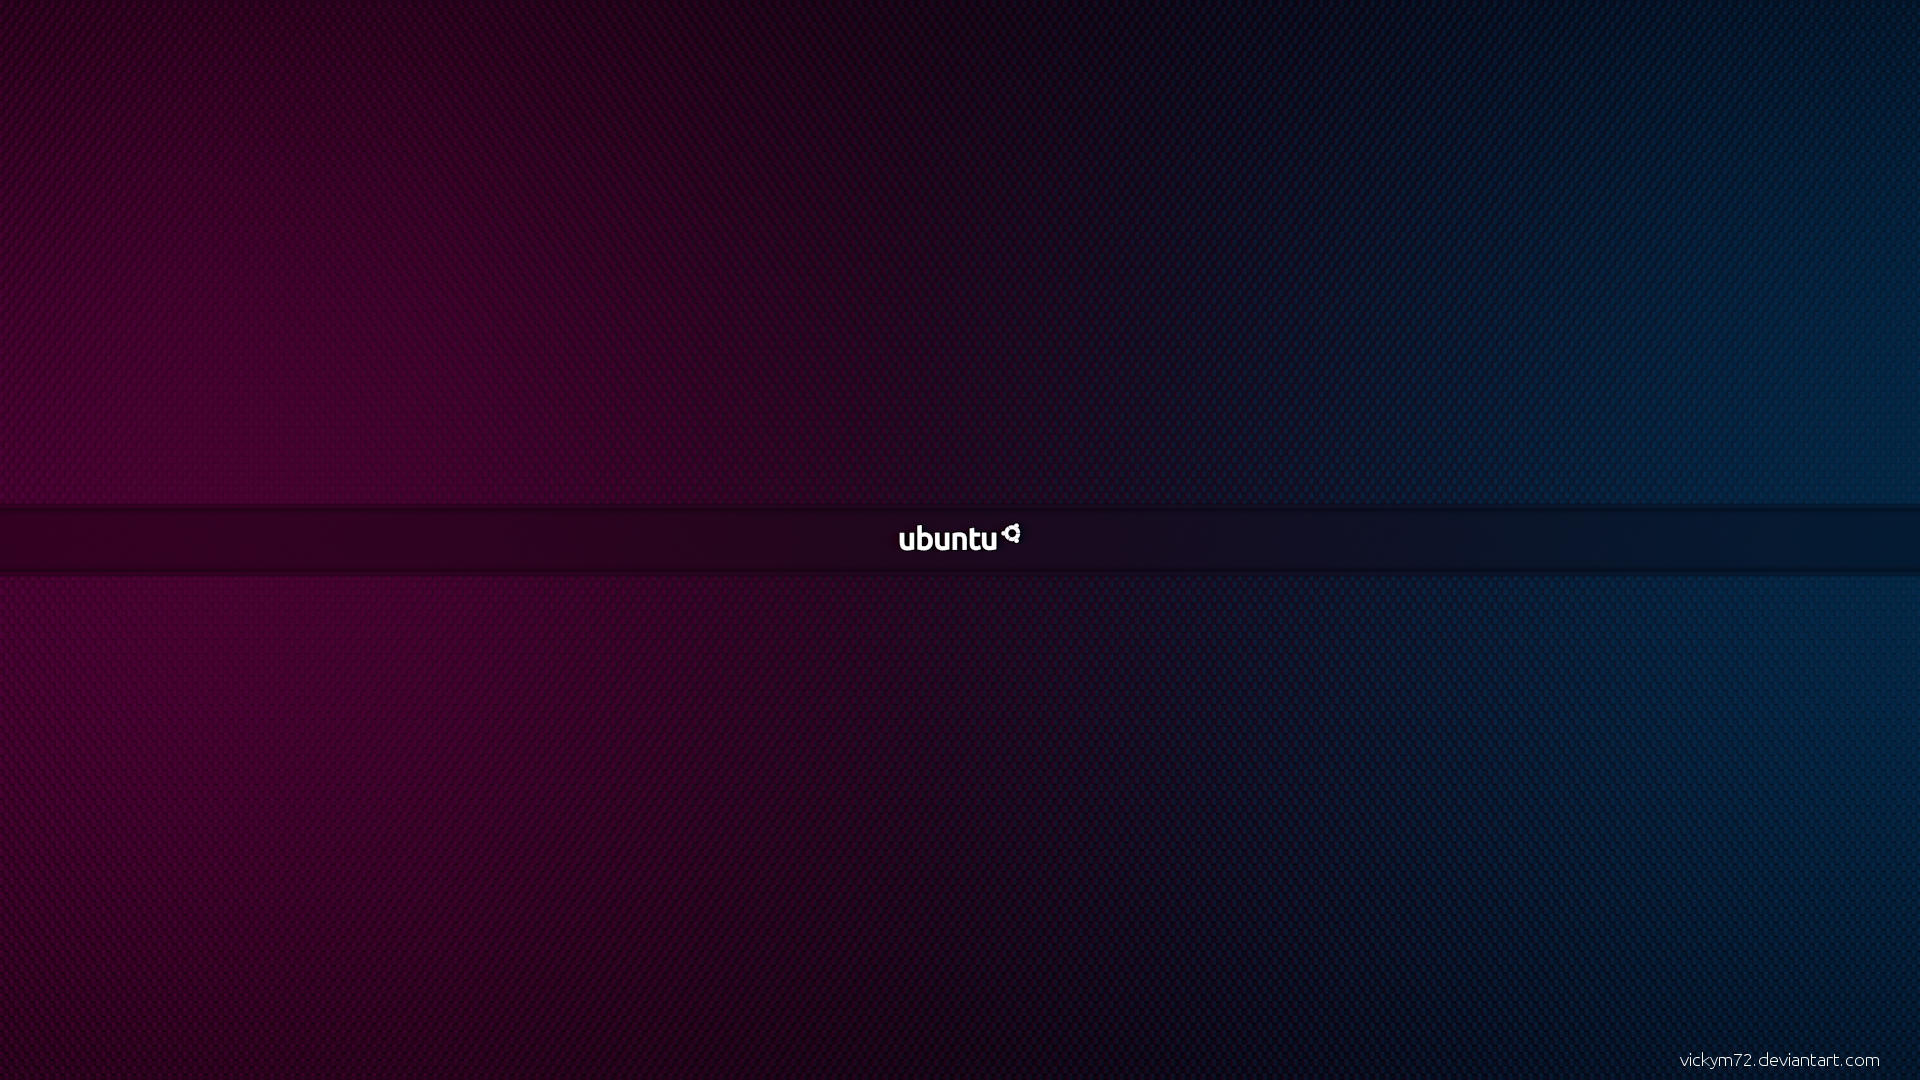 Ubuntu by VickyM72